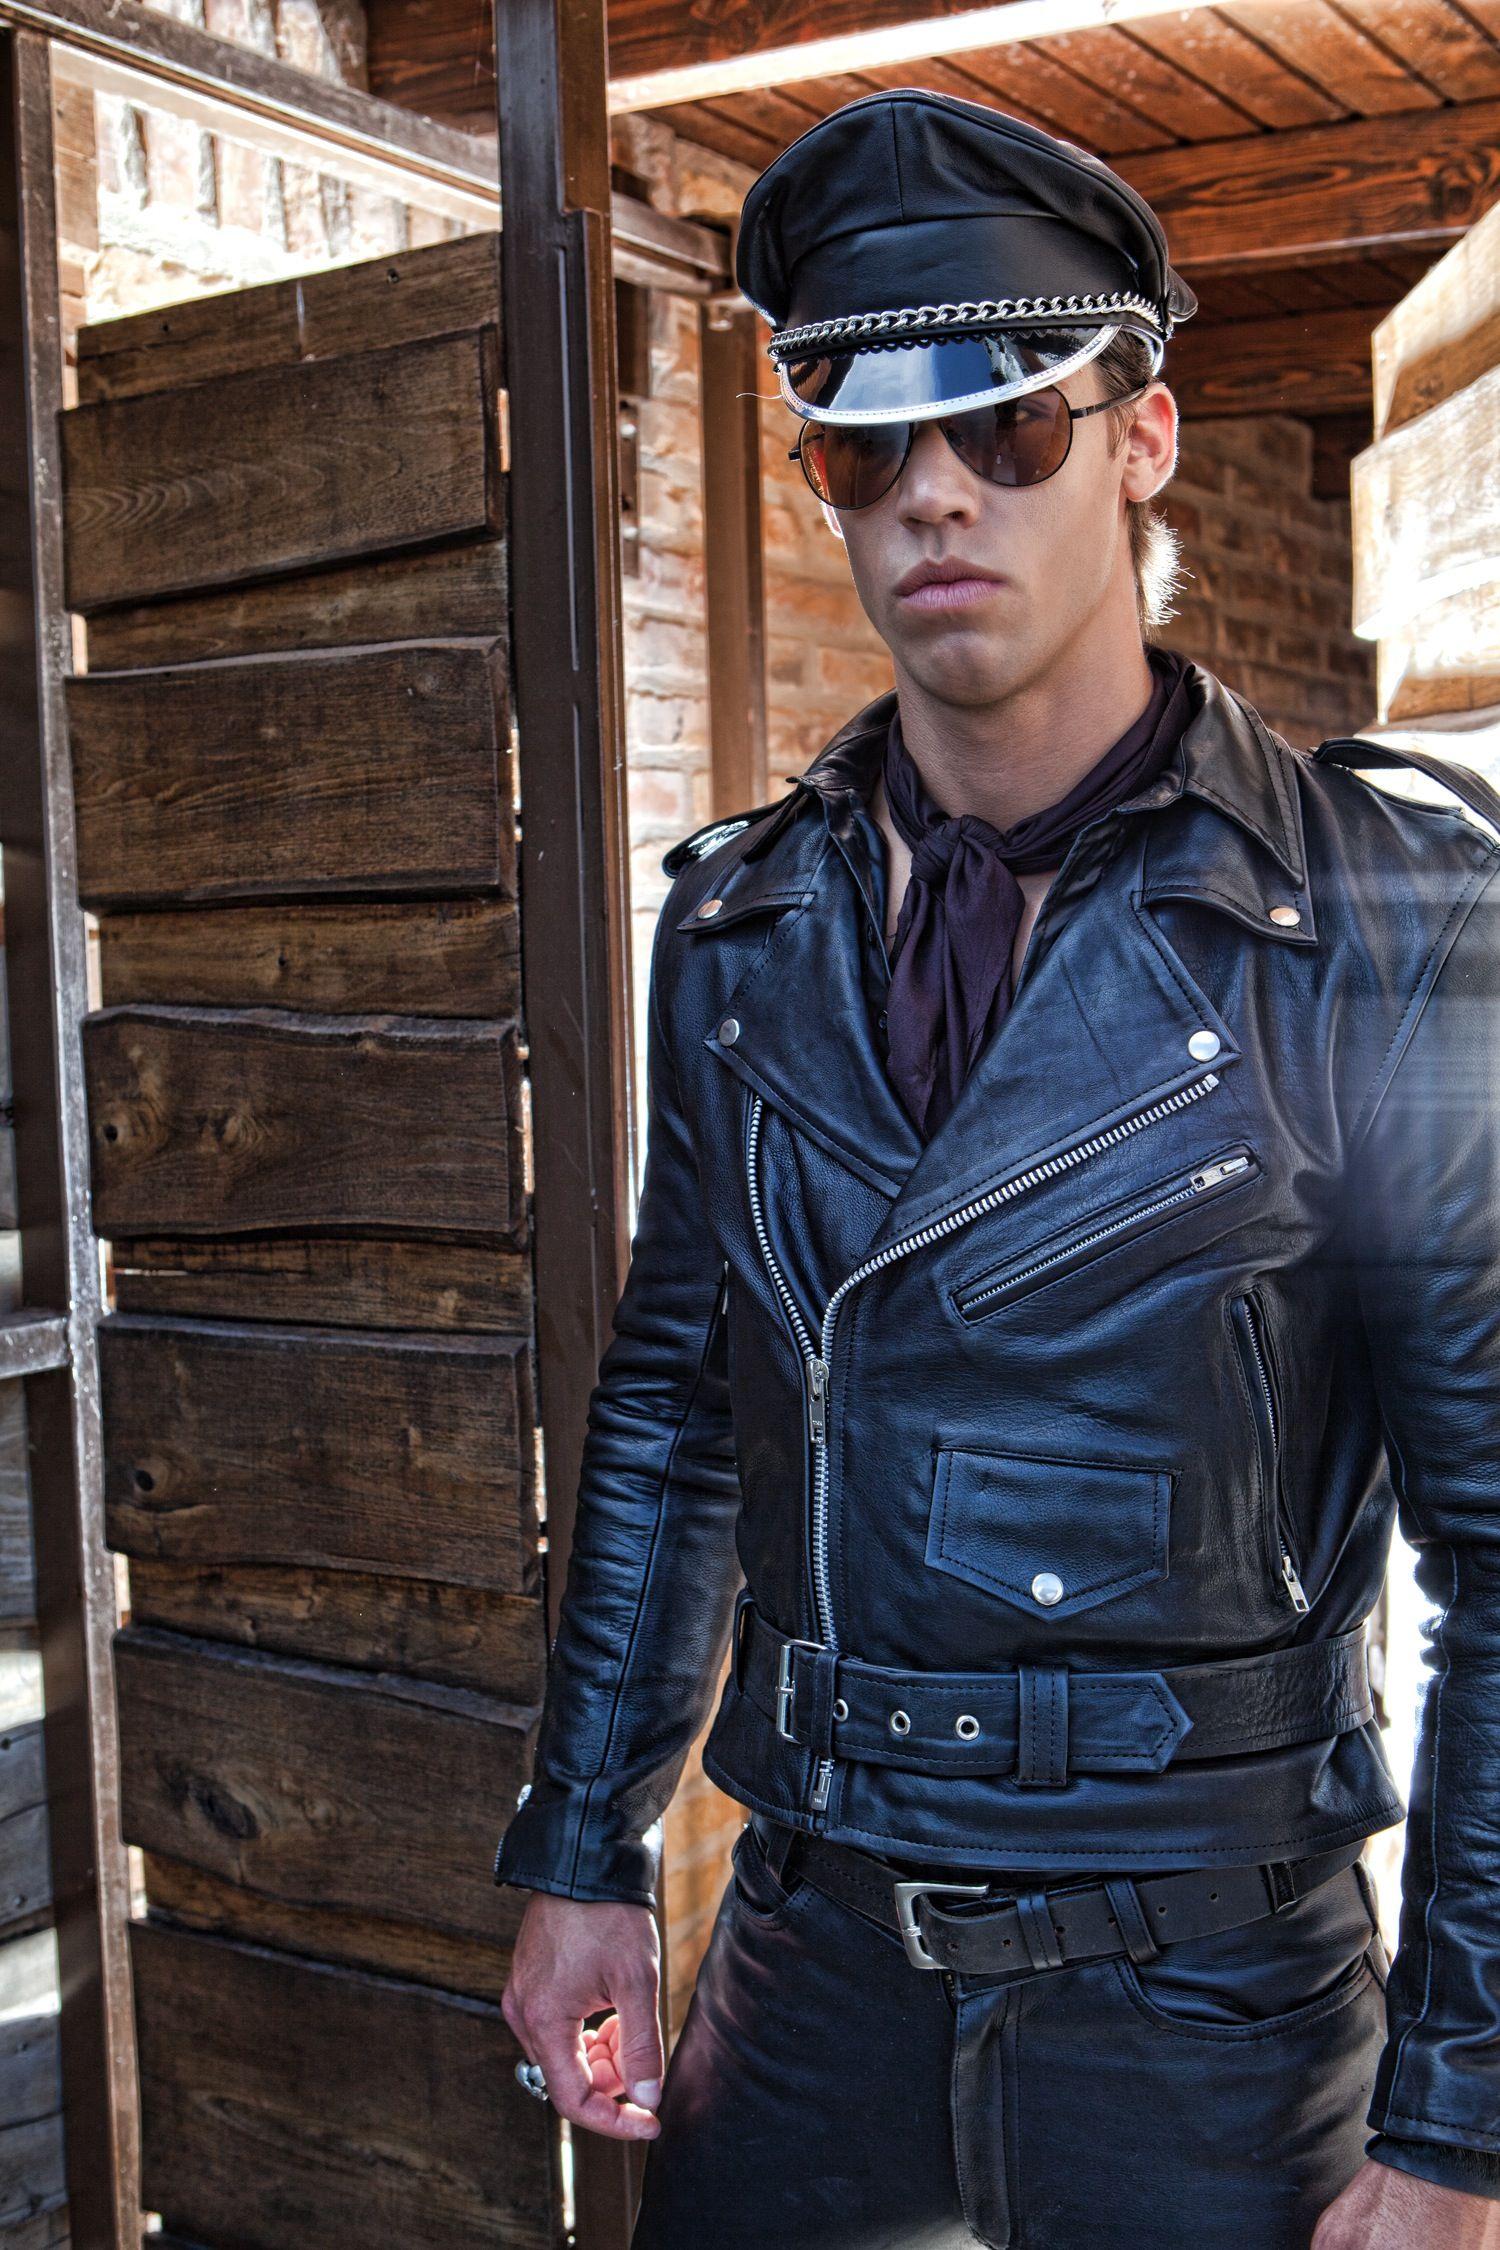 Leather jacket killer b&q - Kris Evans